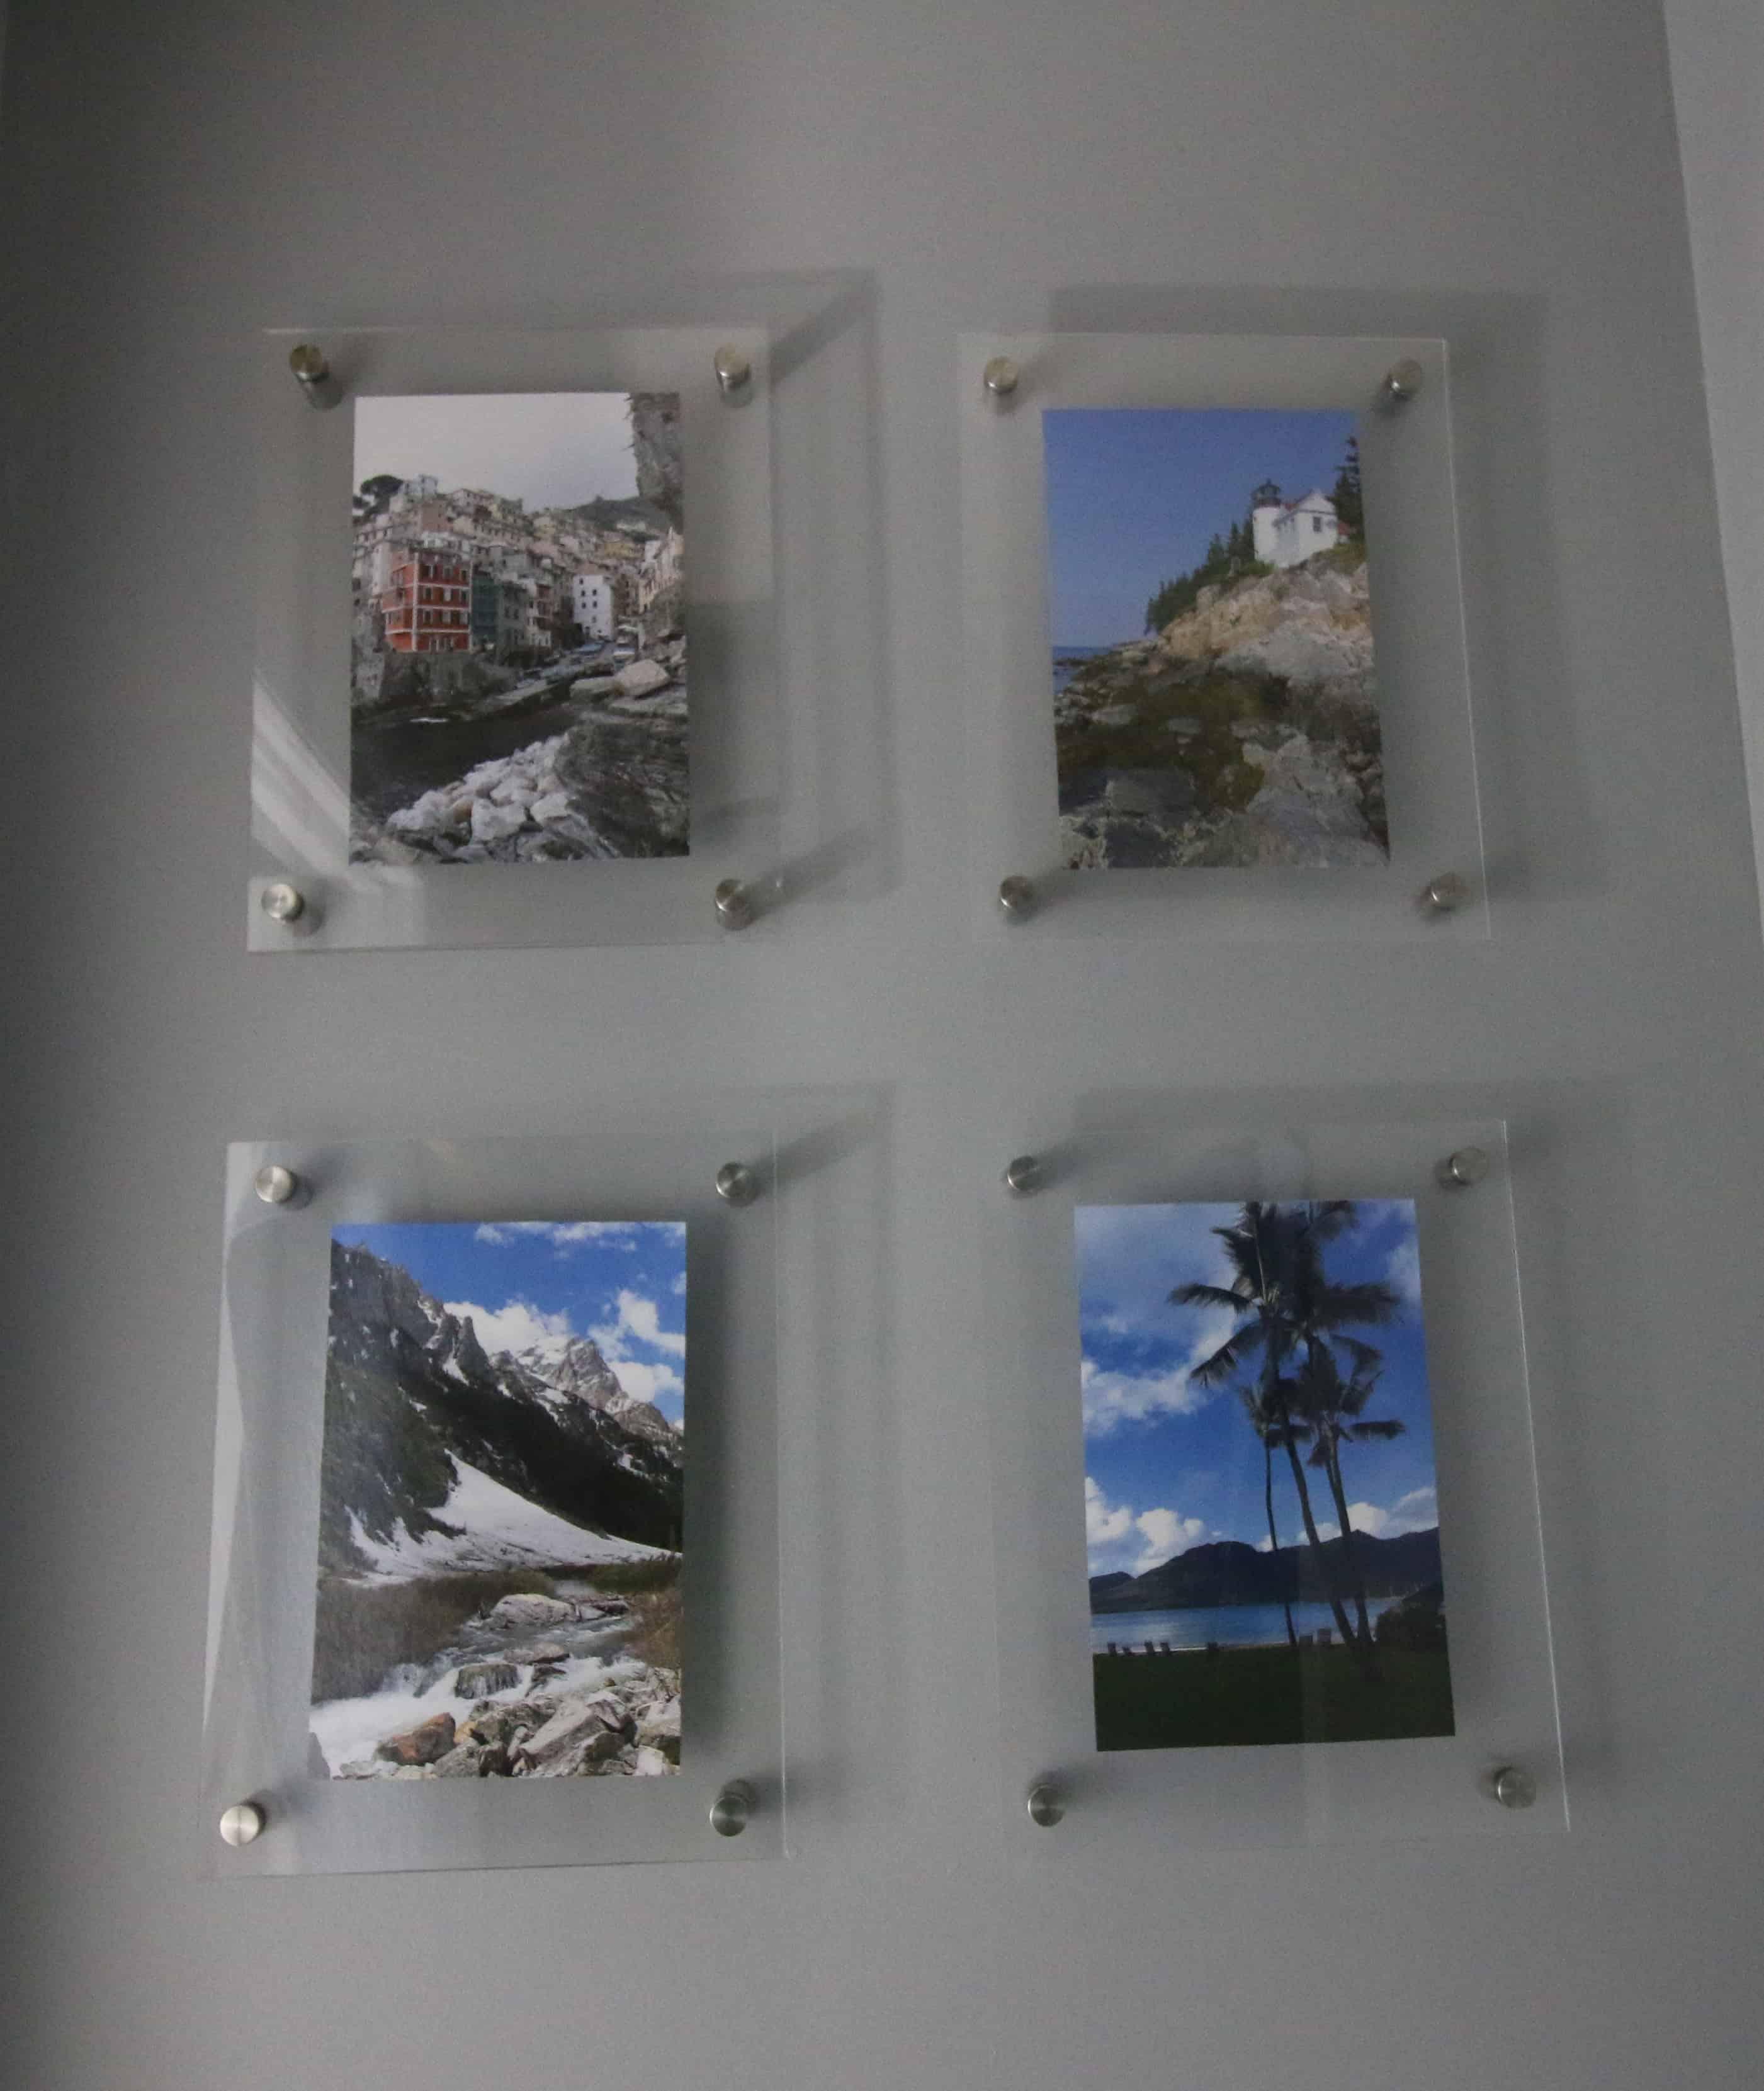 DIY Knock Off Wall Mounted Acrylic Frame Gallery Wall